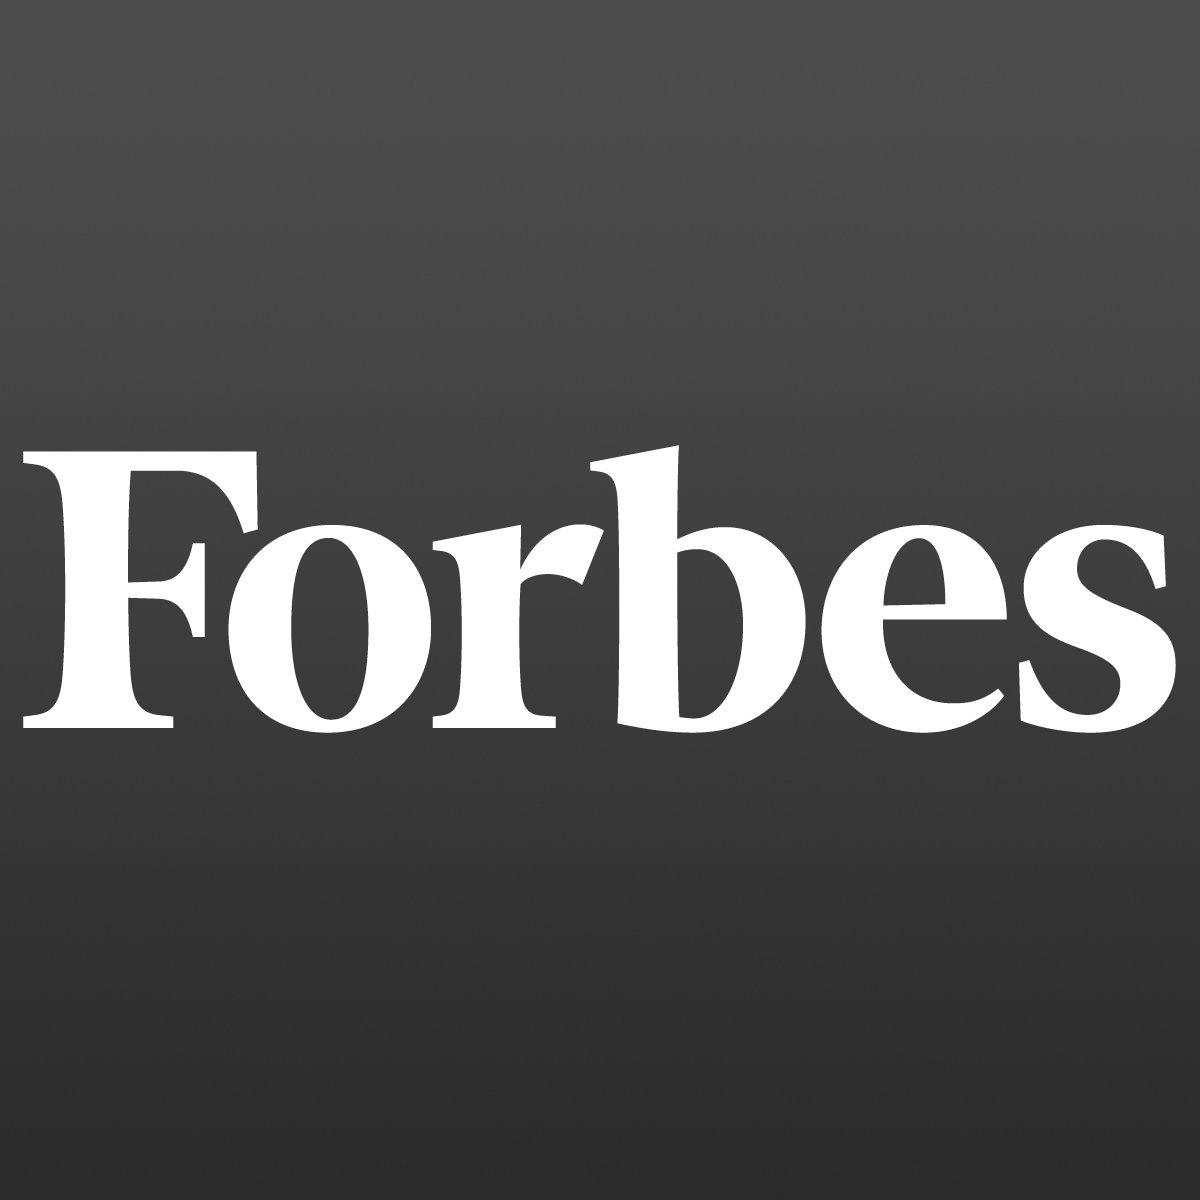 Forbes Asia 30 Under 30 Stars Are Tough To Beat @yinsylvia92 @Shopprapp https://t.co/0UtOzovtnD #tech #startups https://t.co/GbBOB9wLnU